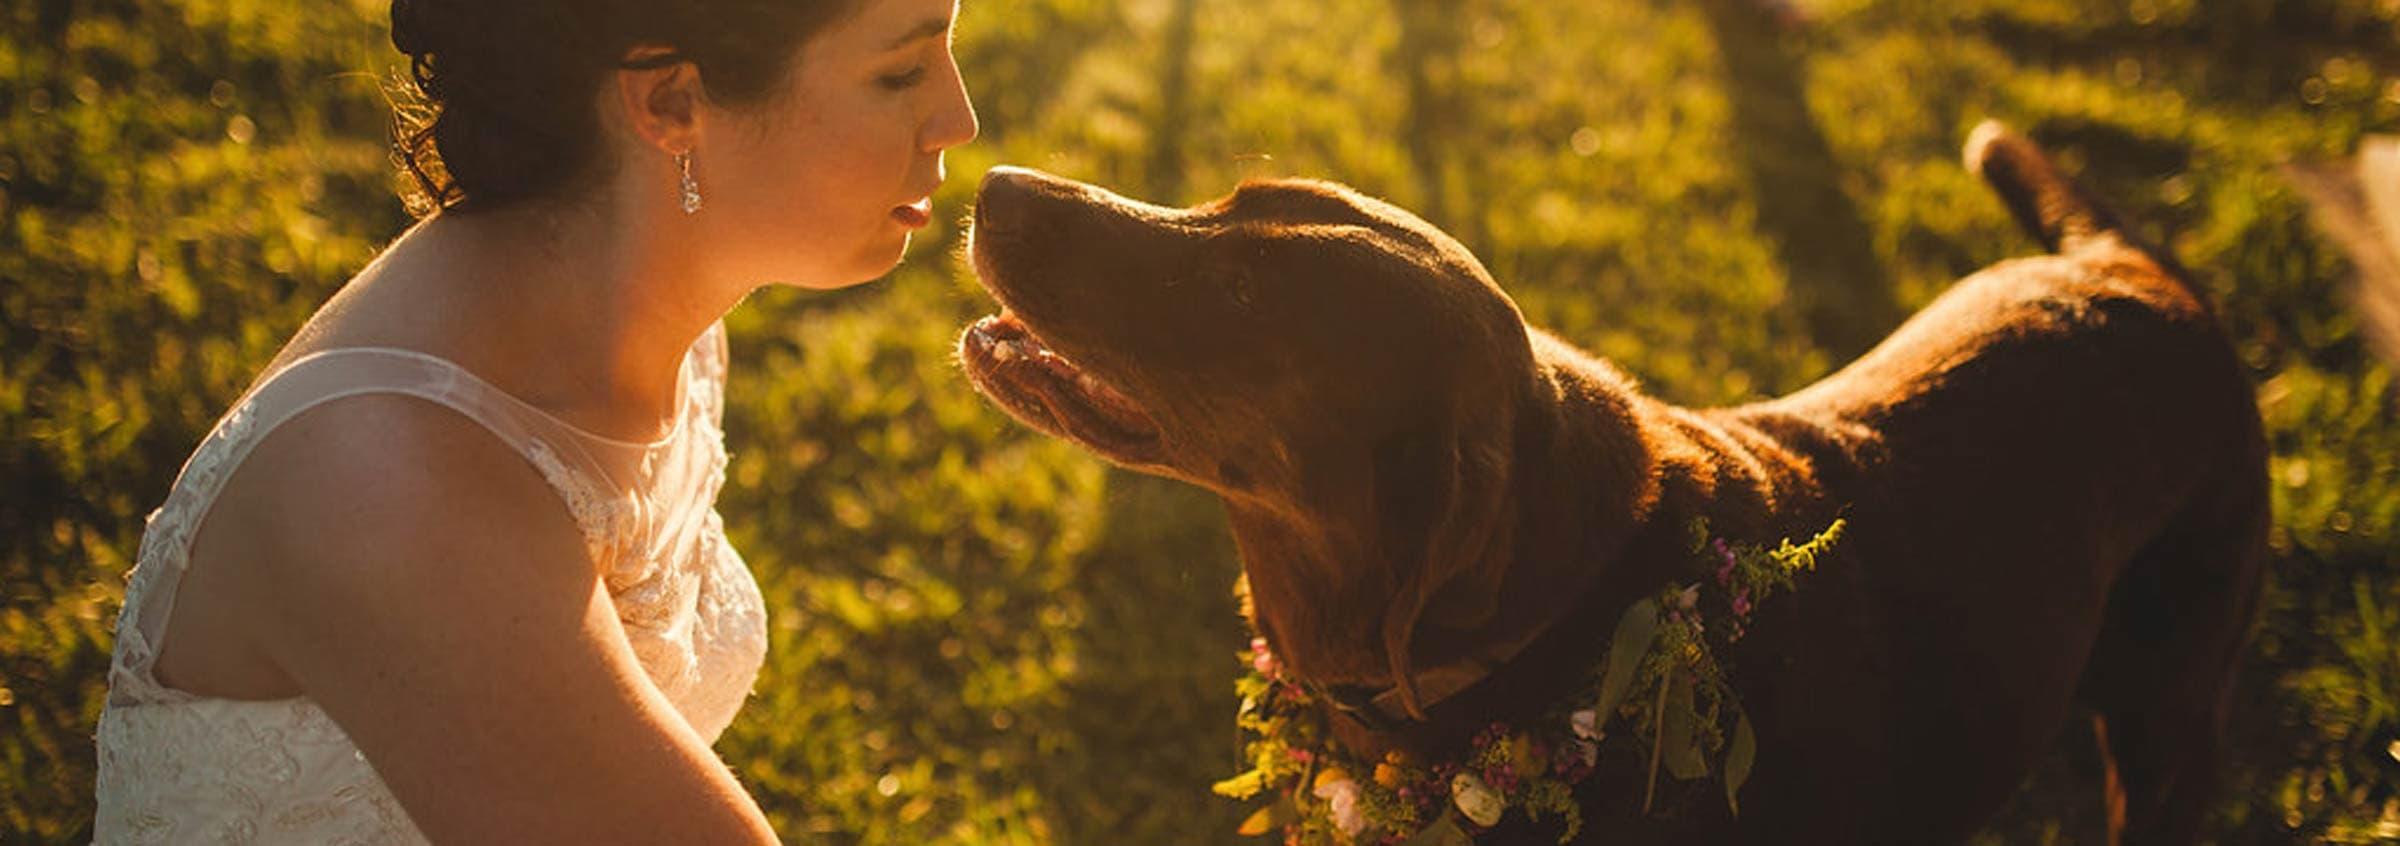 wedding-dog-flowers